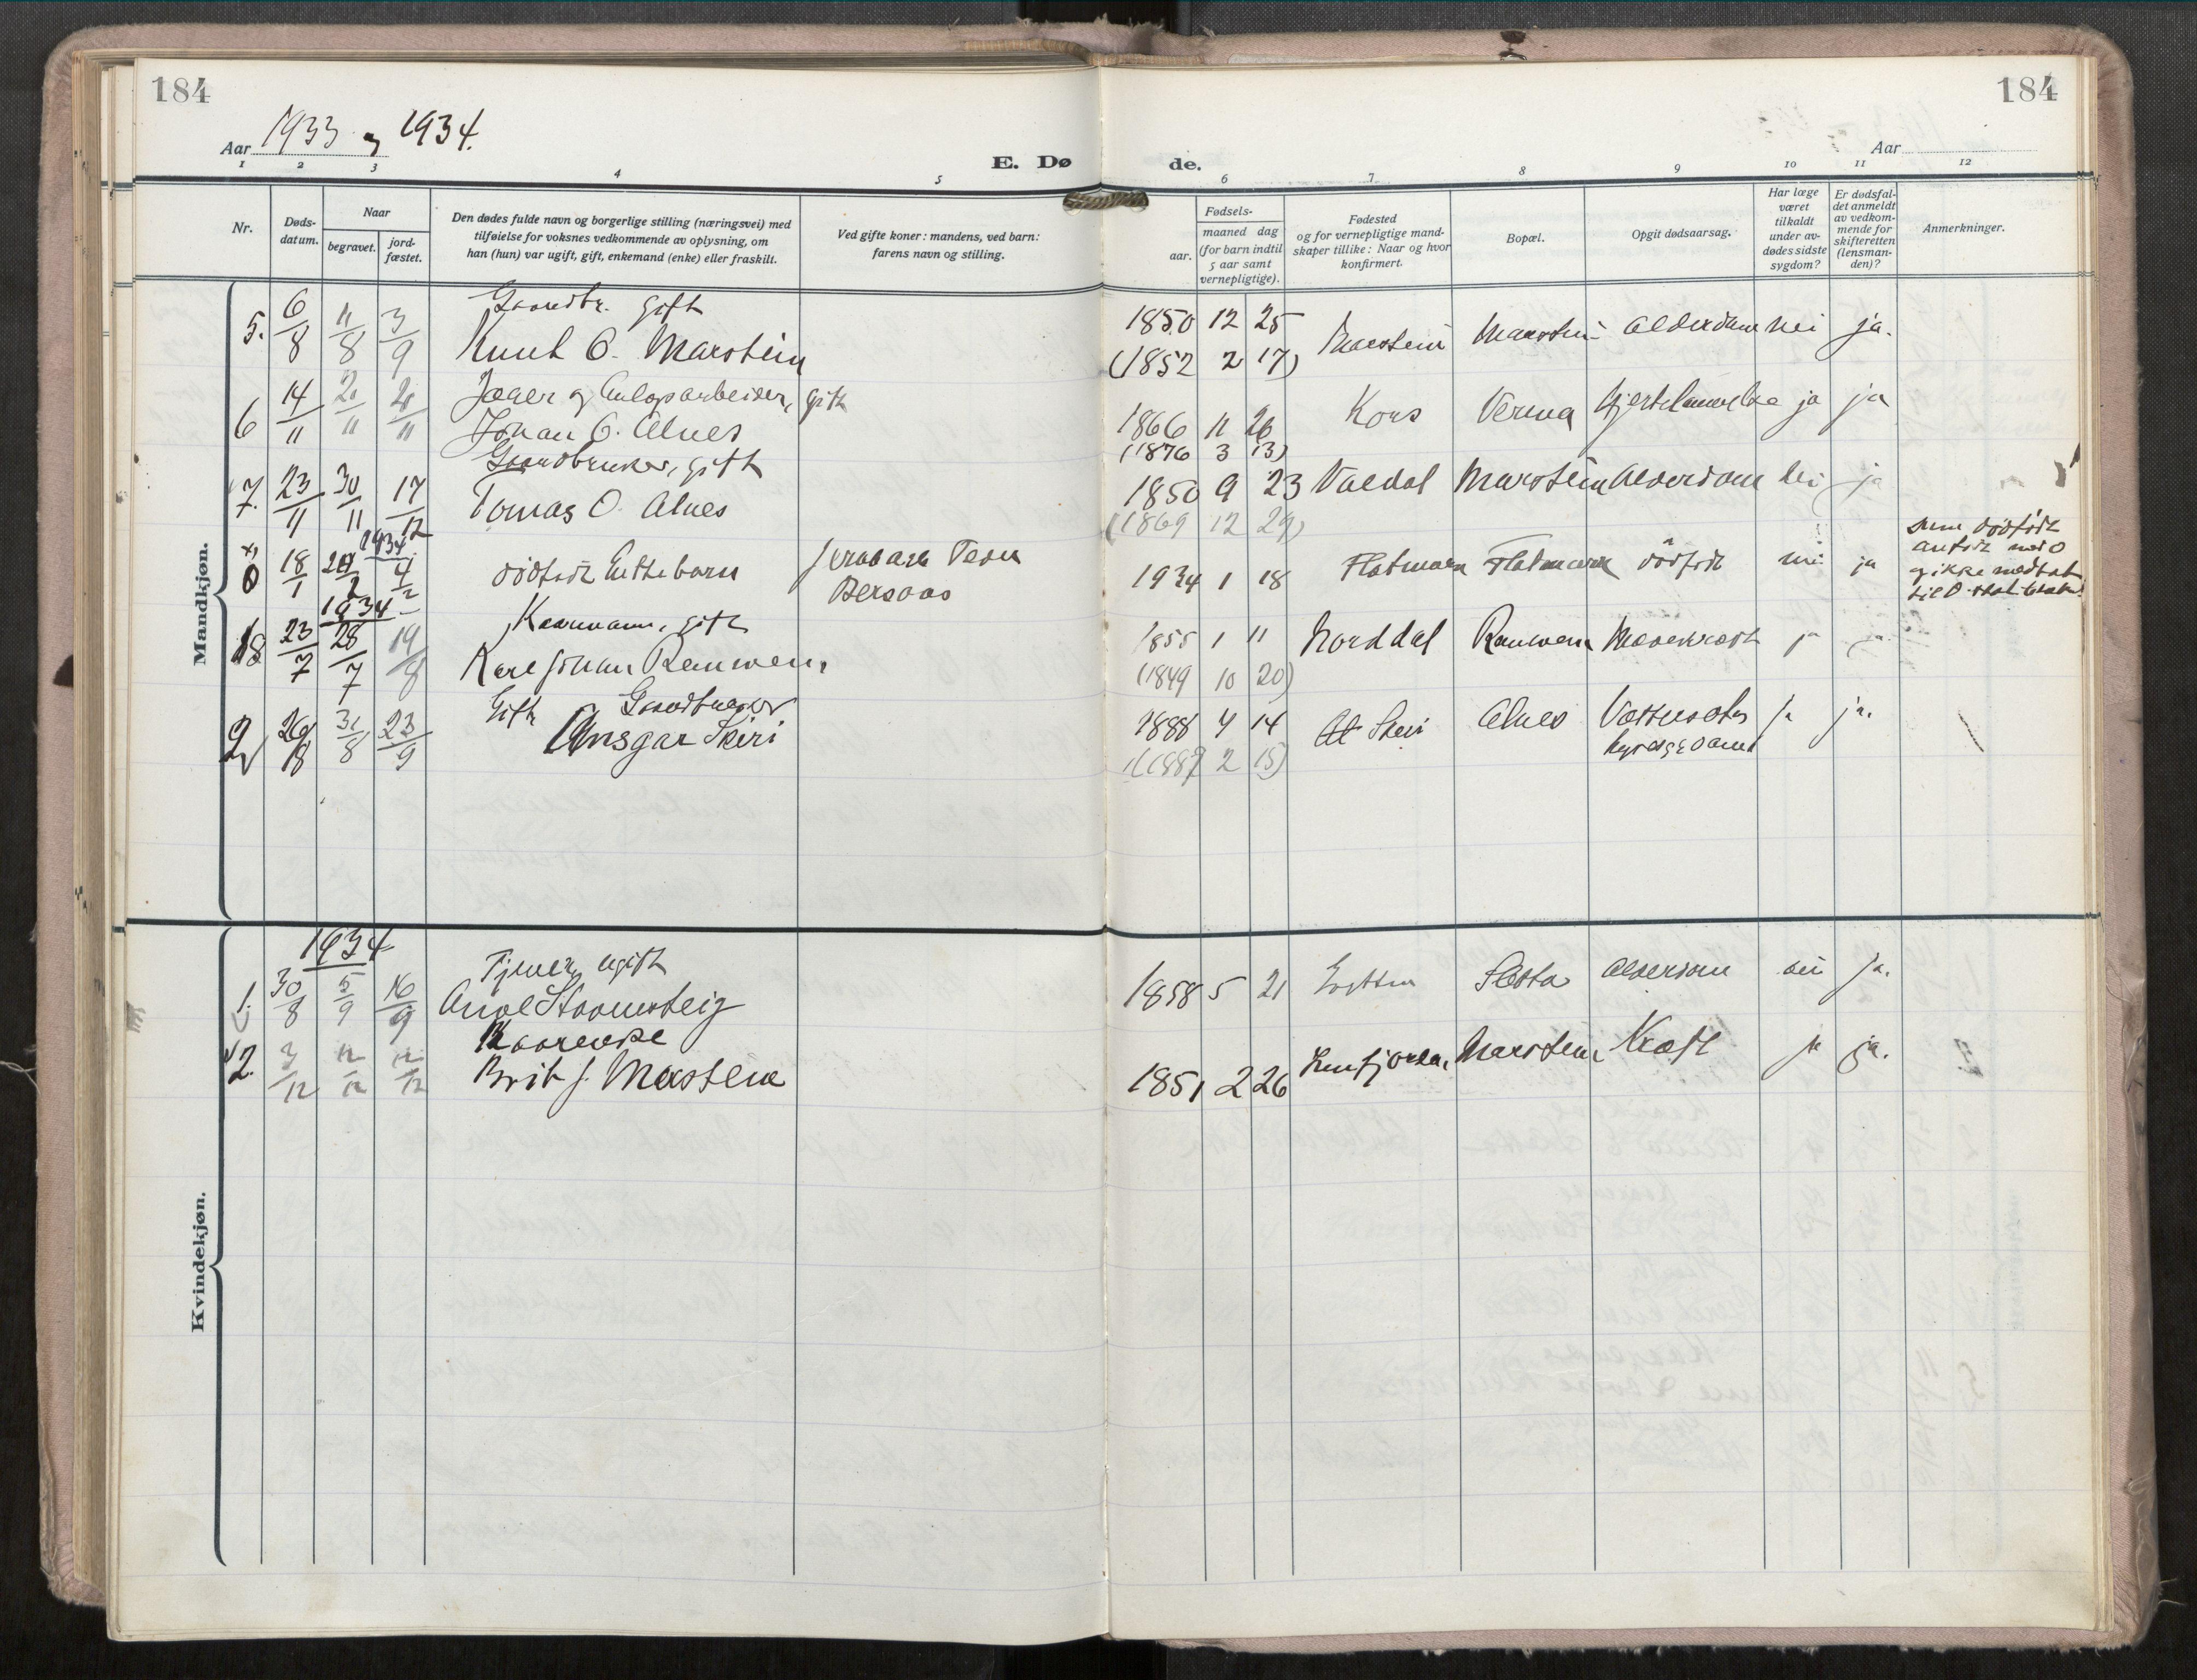 SAT, Grytten sokneprestkontor, Ministerialbok nr. 546A04, 1919-1956, s. 184